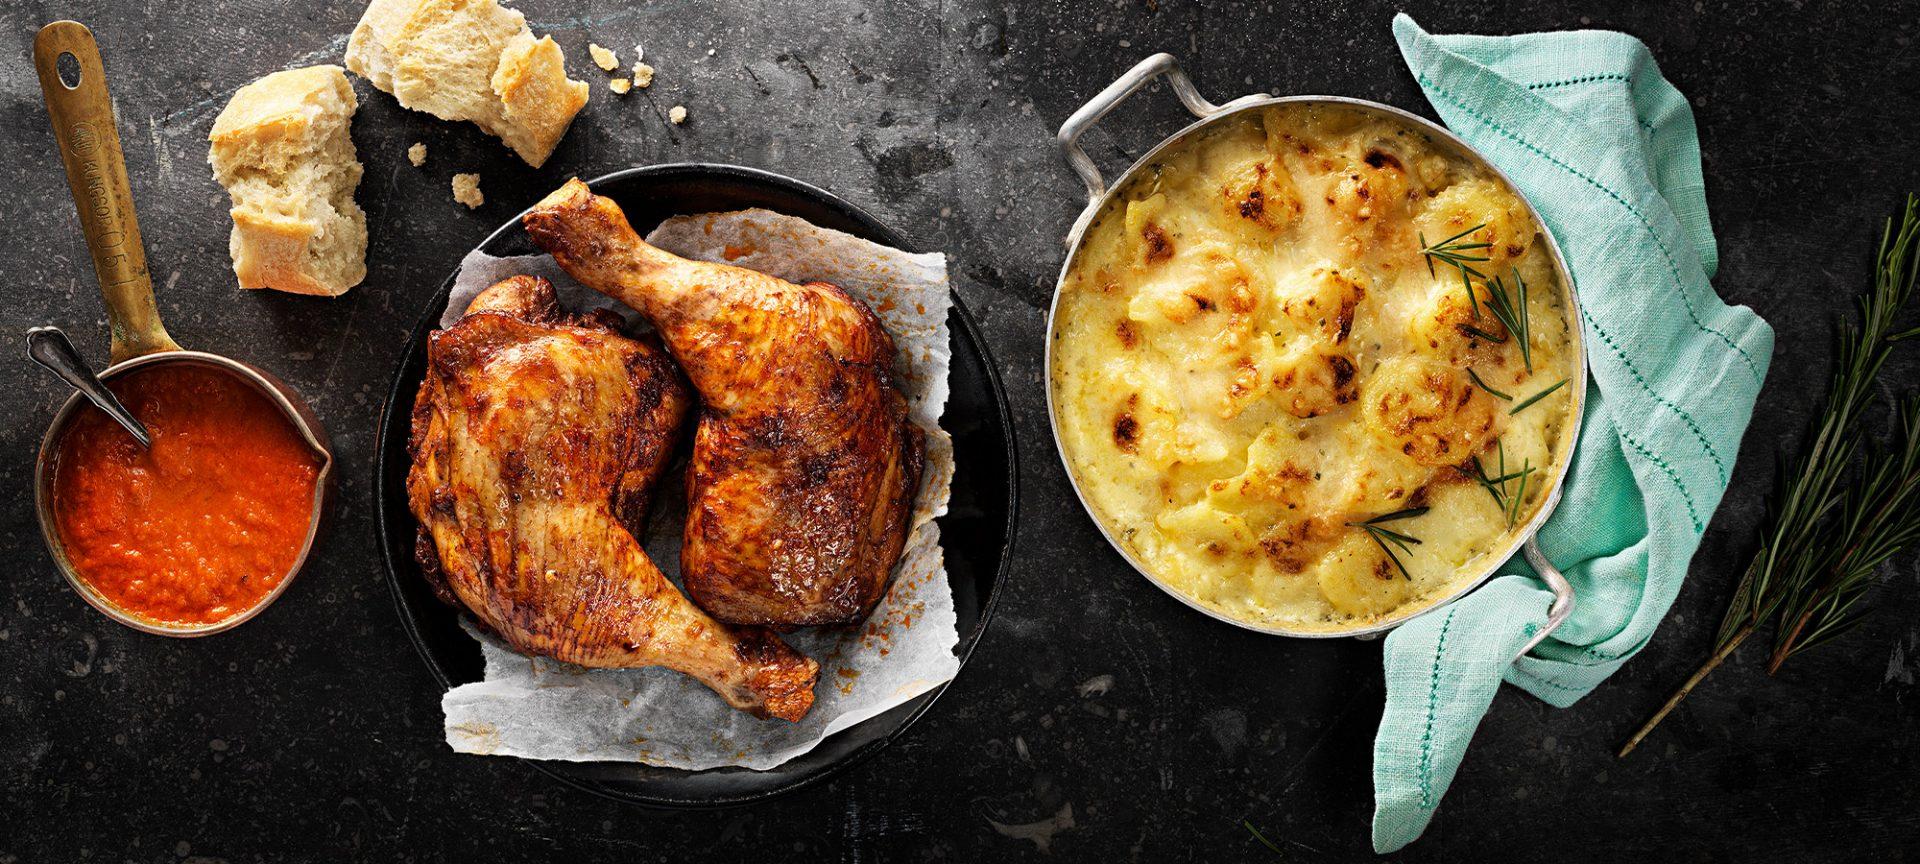 kalorier grillad kyckling utan skinn